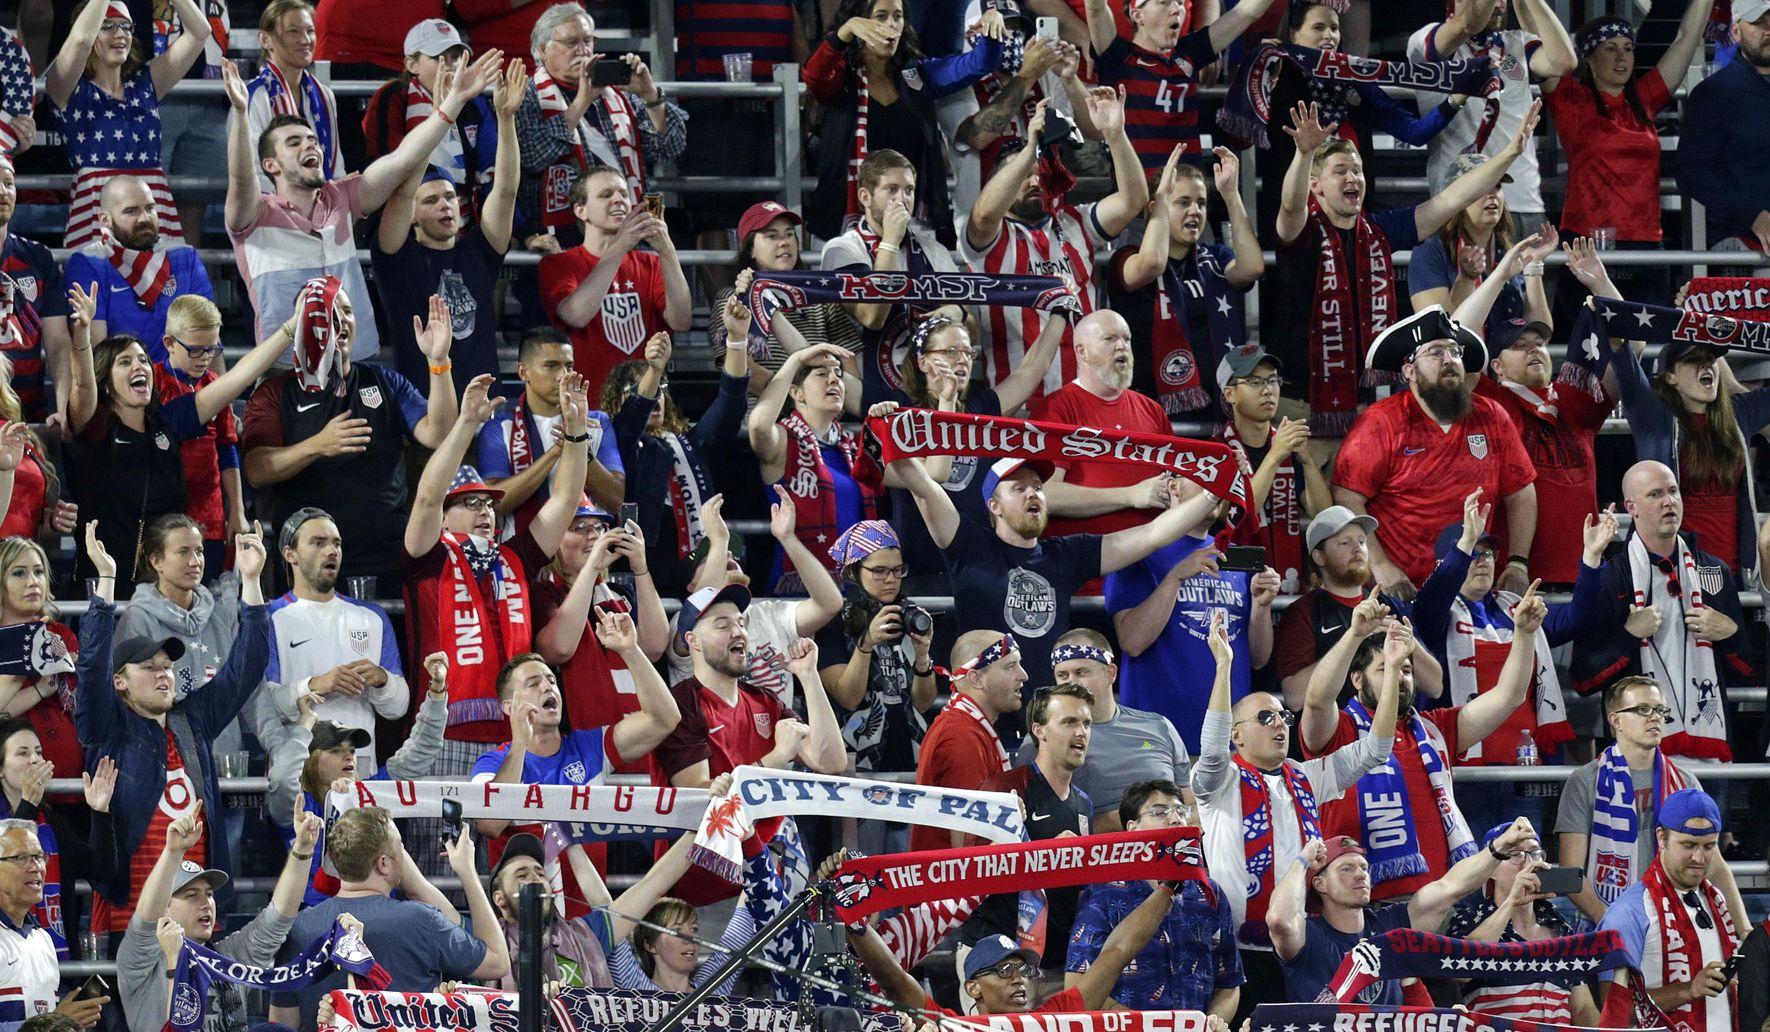 U.S. soccer fans chant 'F--- Trump' on live TV shot